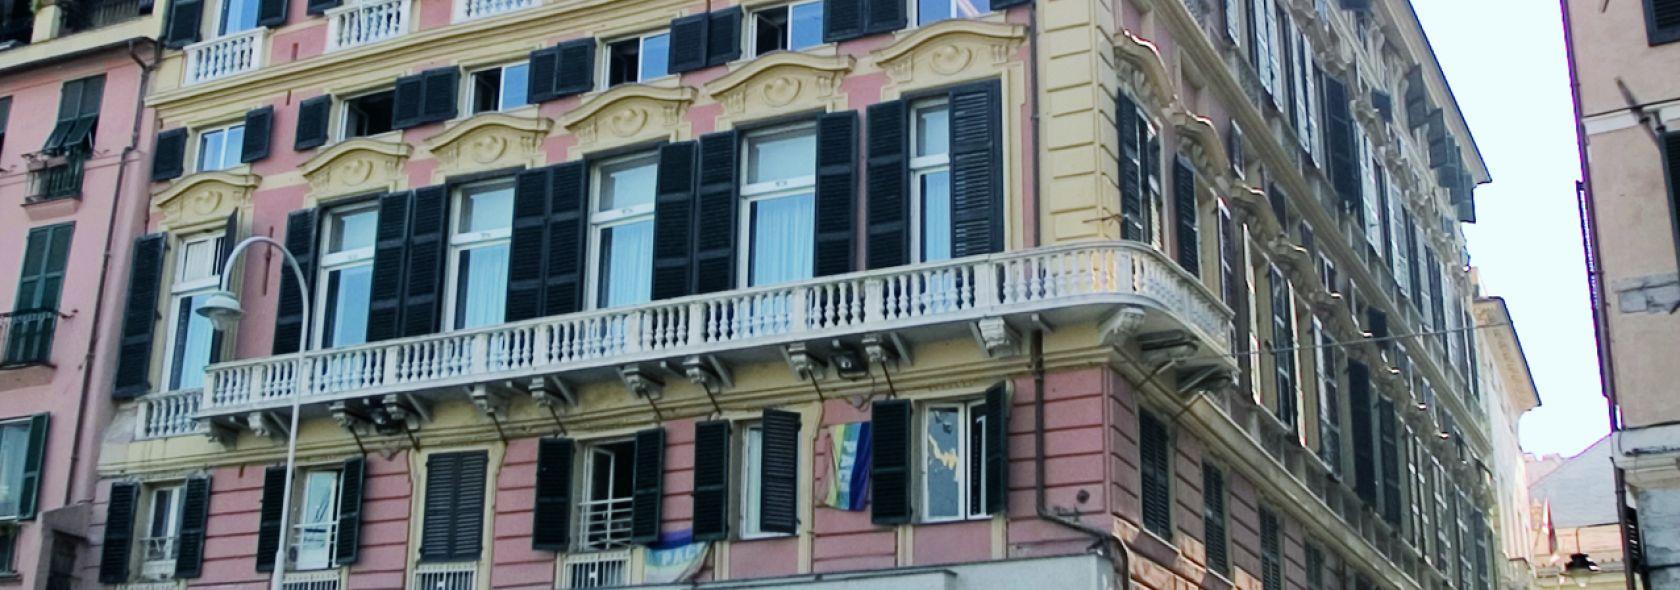 Palazzo Emanuele Filiberto Di Negro